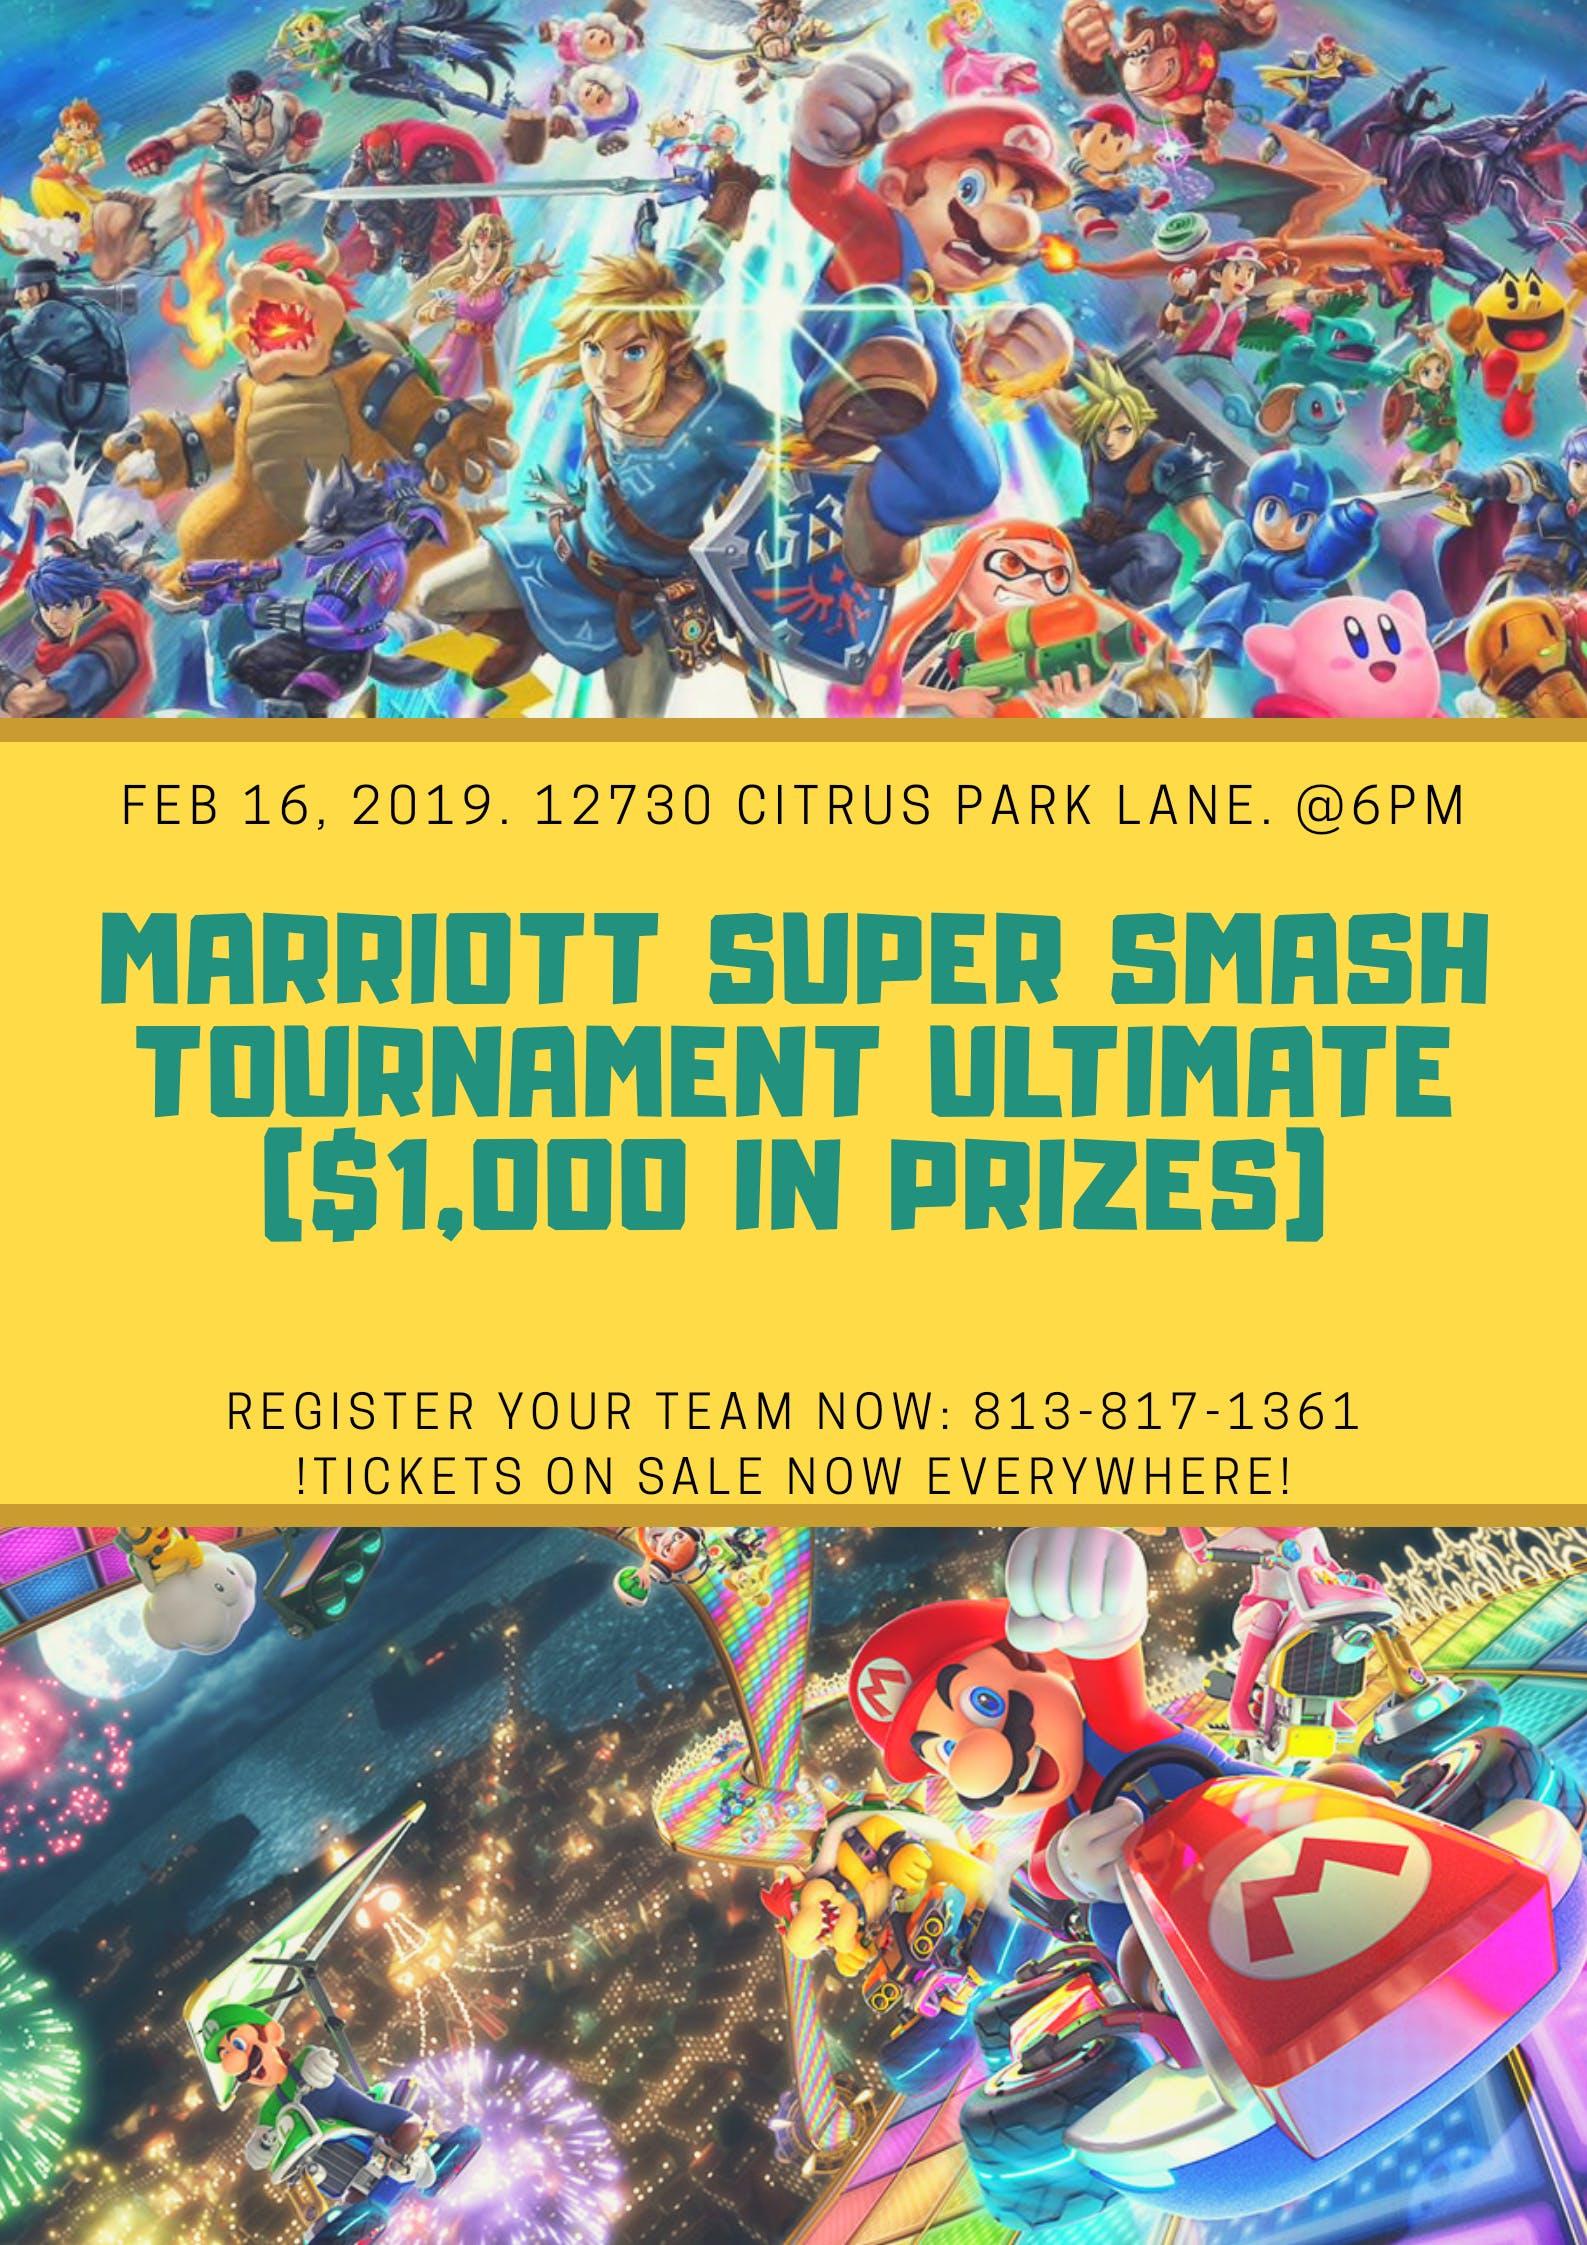 Mario Tournament at the Marriott (Tampa, Fl)